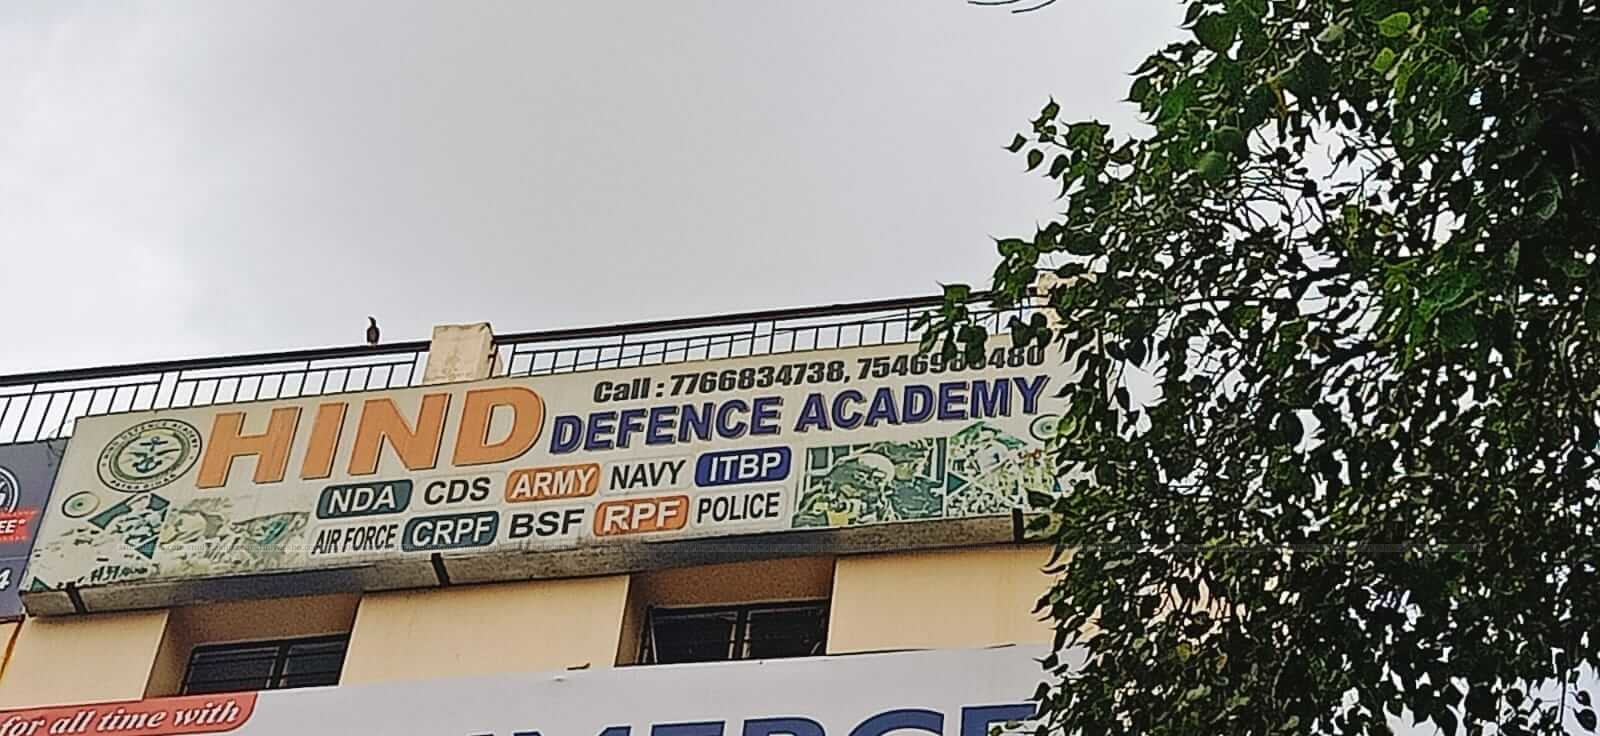 HIND DEFENCE ACADEMY Logo